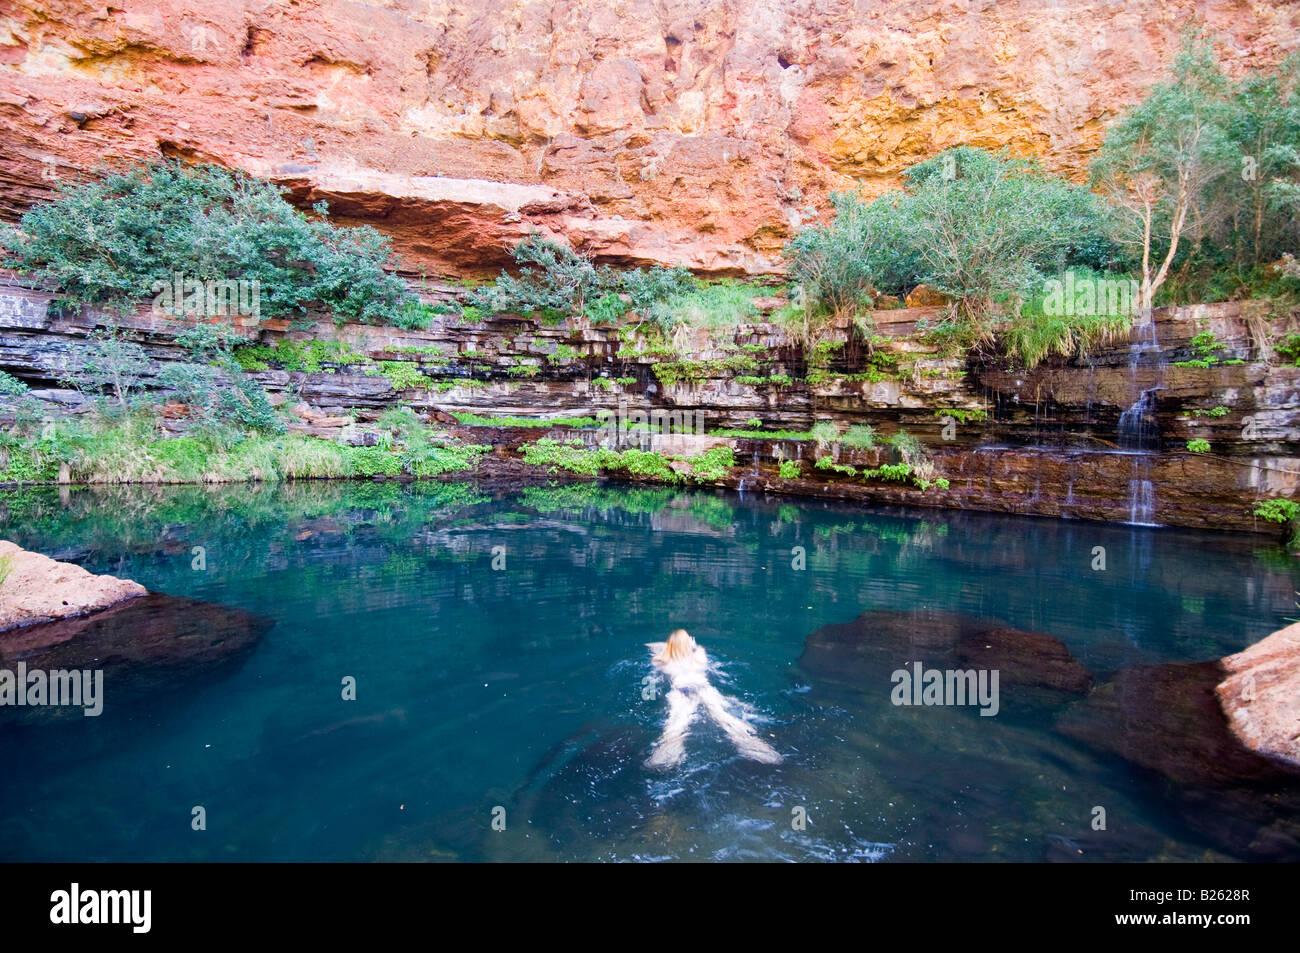 Swimming At Circular Pool In Karijini National Park Western Stock Photo Royalty Free Image